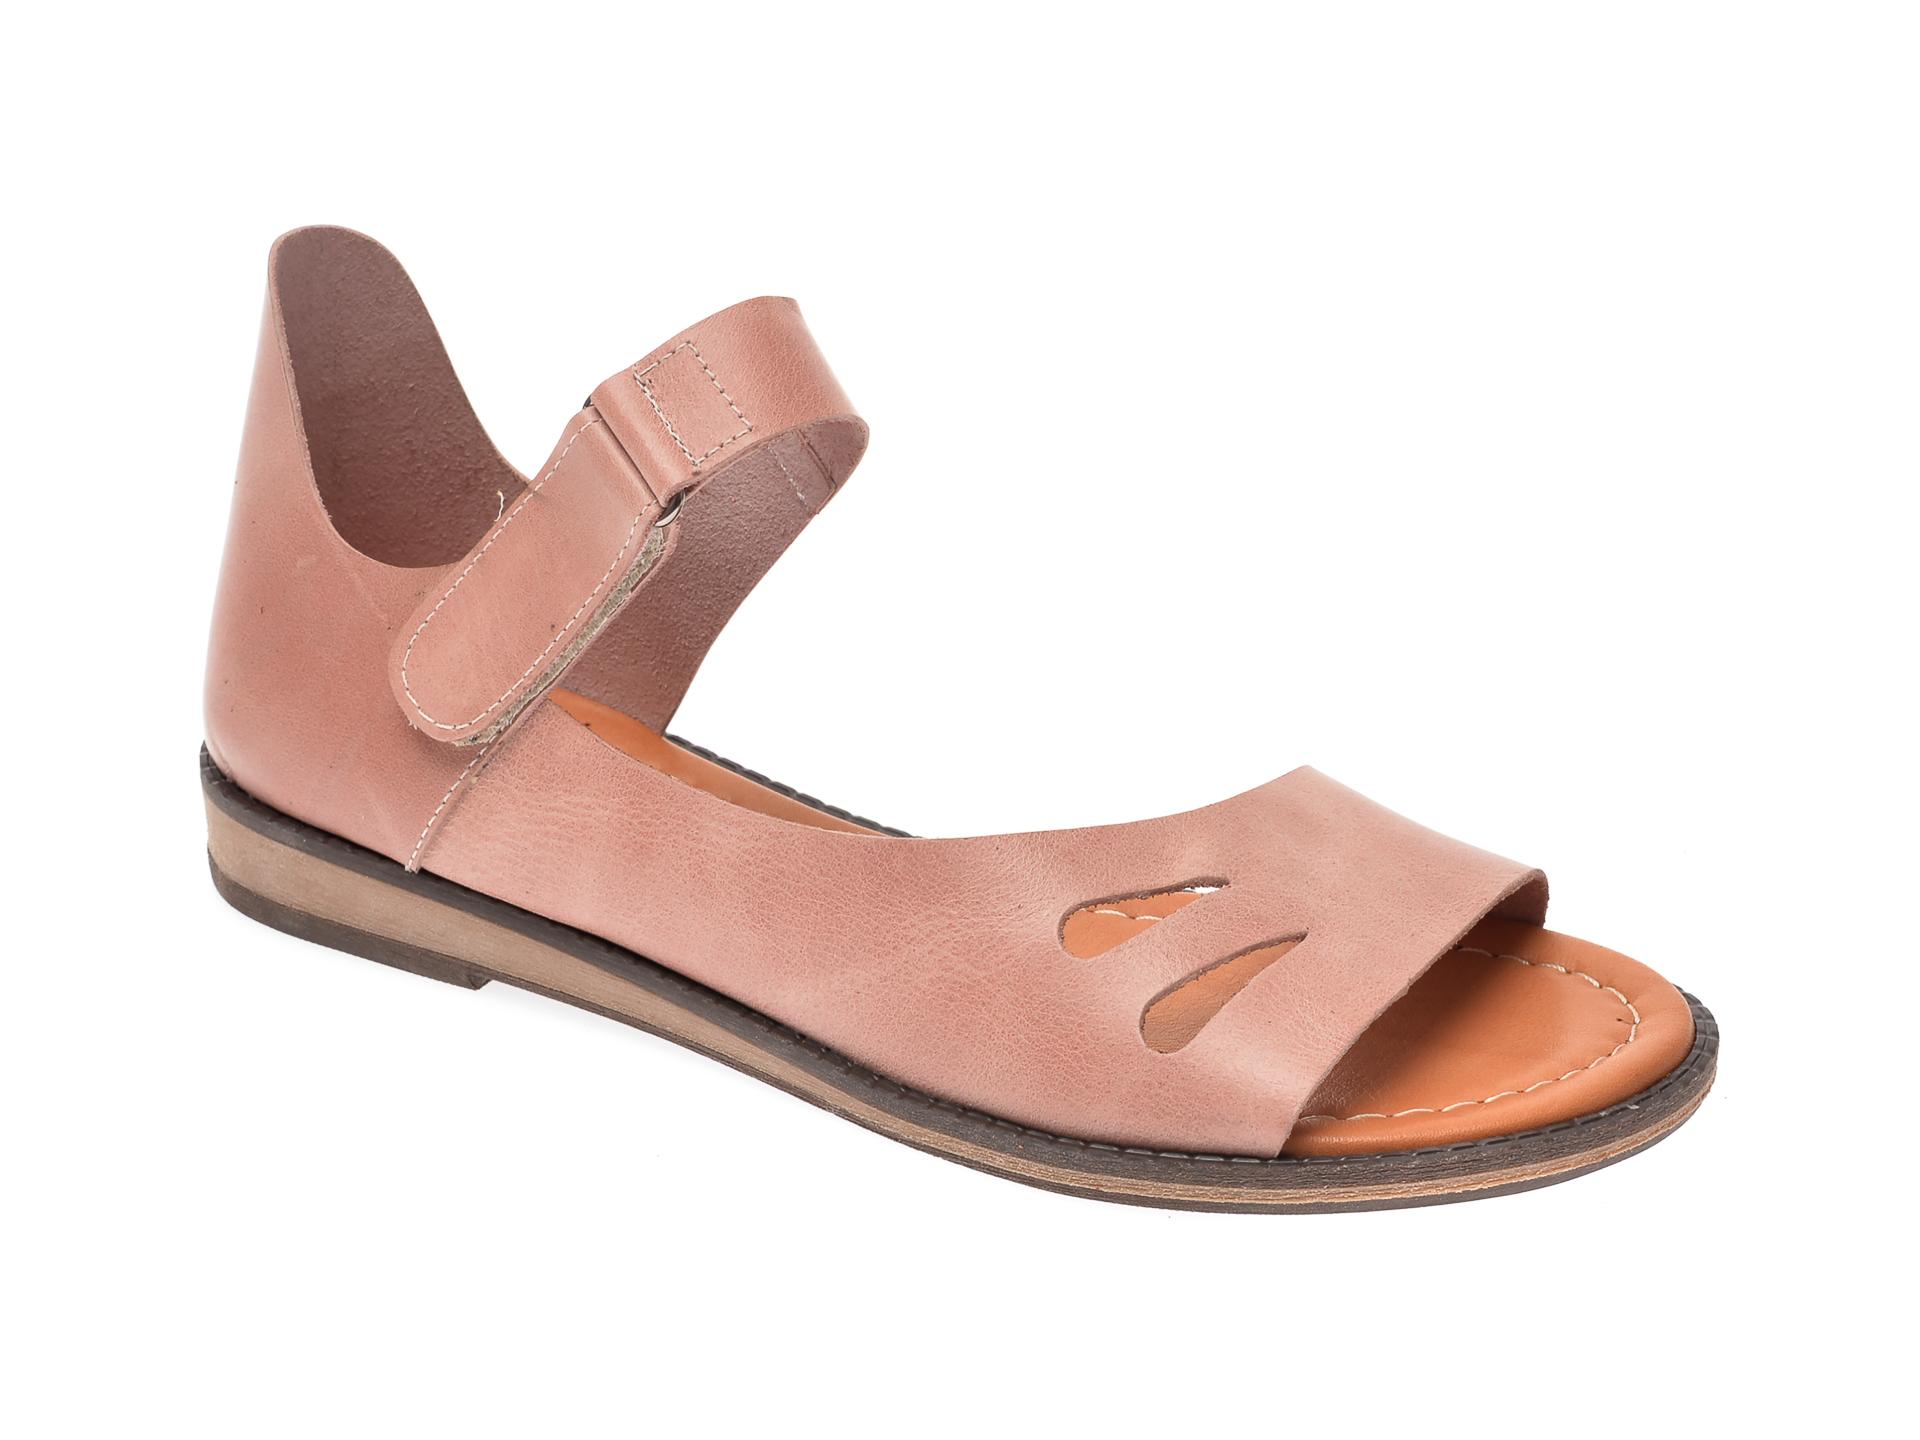 Sandale IMAGE roz, 118, din piele naturala imagine